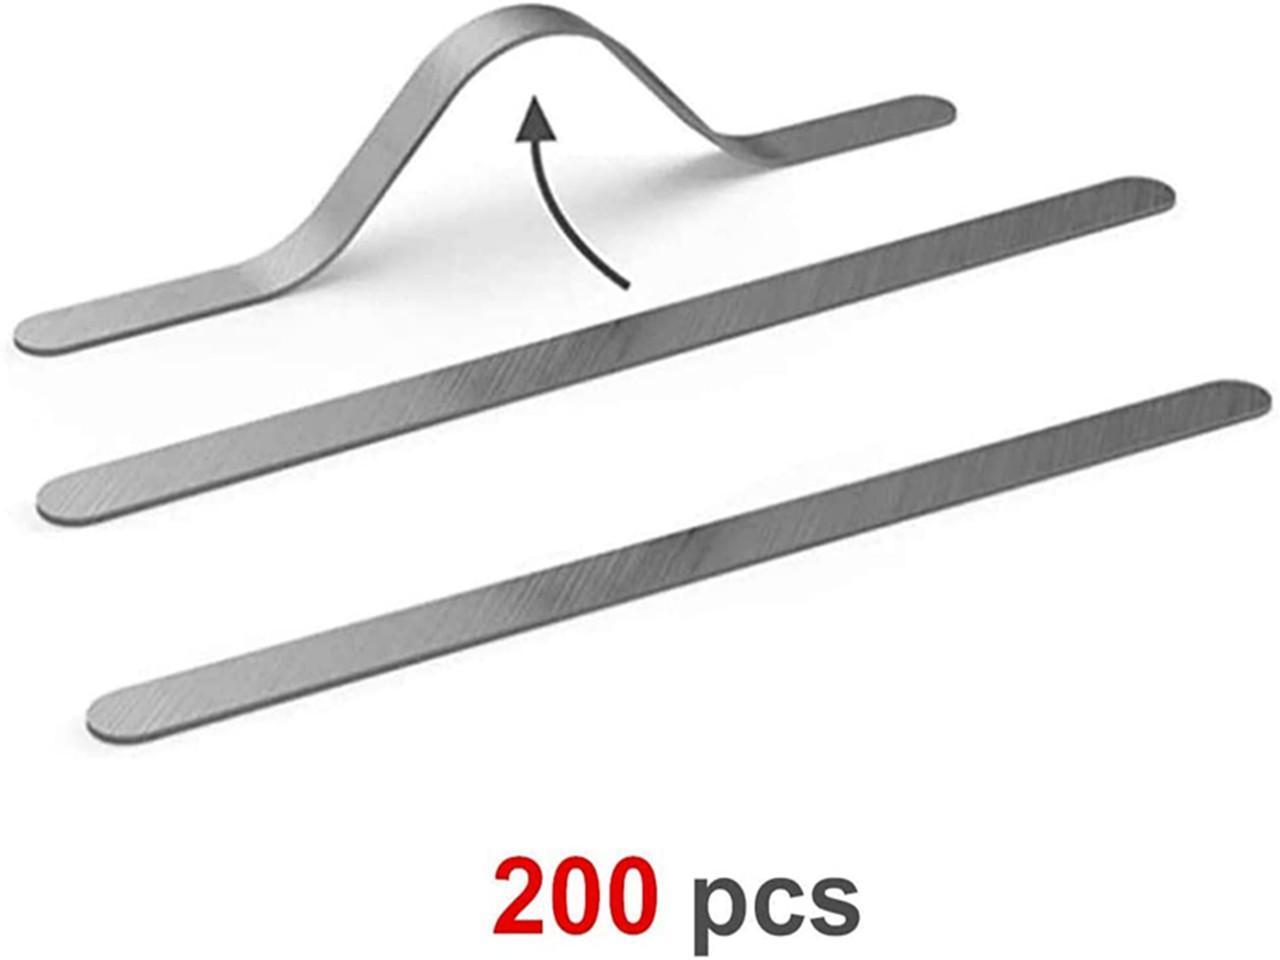 BESPORTBLE 10pcs Plastic Strips Nose Wire Nose Bridge Bracket Nose Clips for Outdoor Riding Bandana Face Cover Black